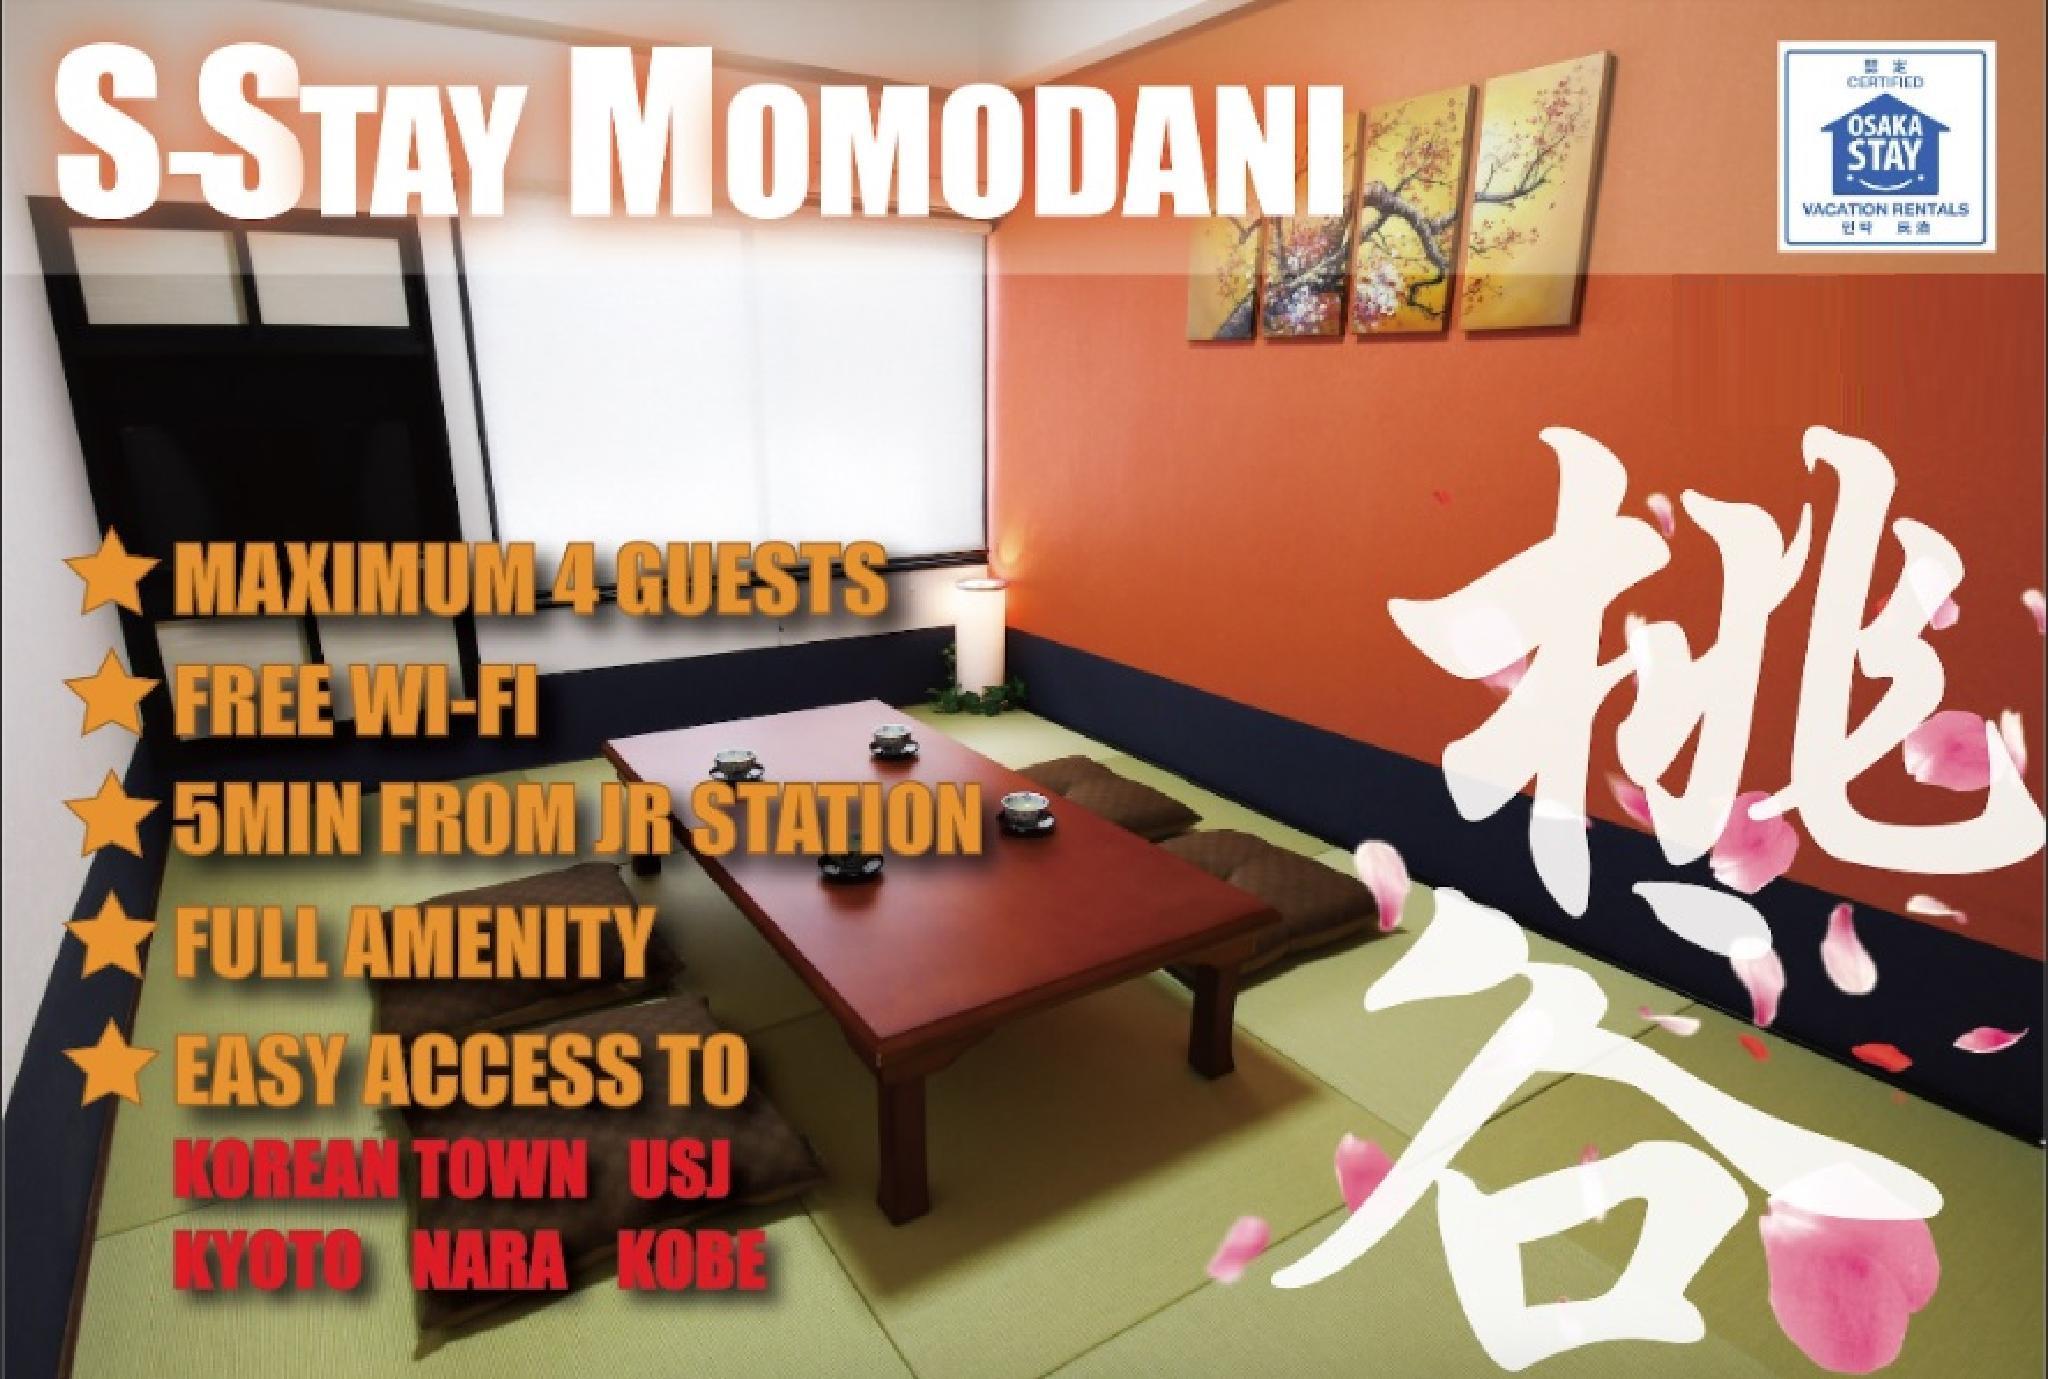 S Stay LEGAL Calm Area Dotonbori Osaka Castle USJ